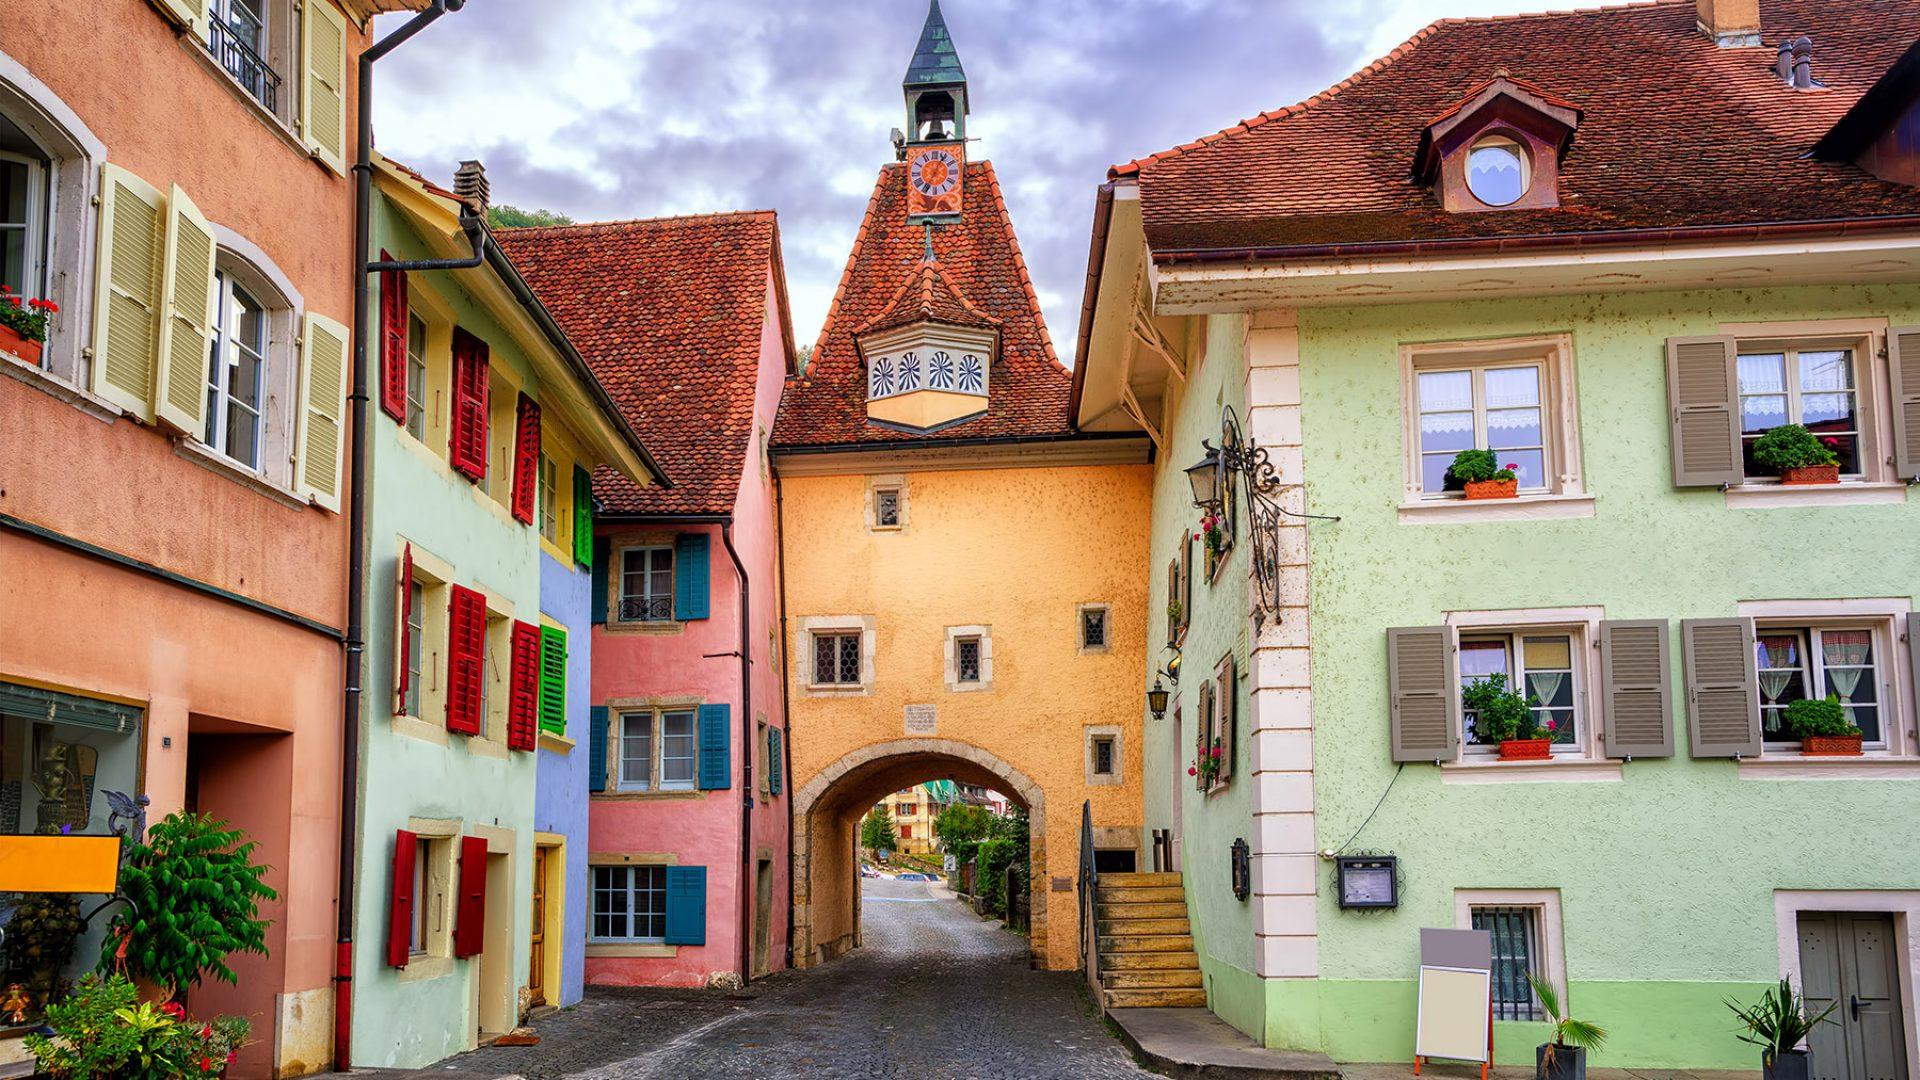 Prettiest towns in Switzerland